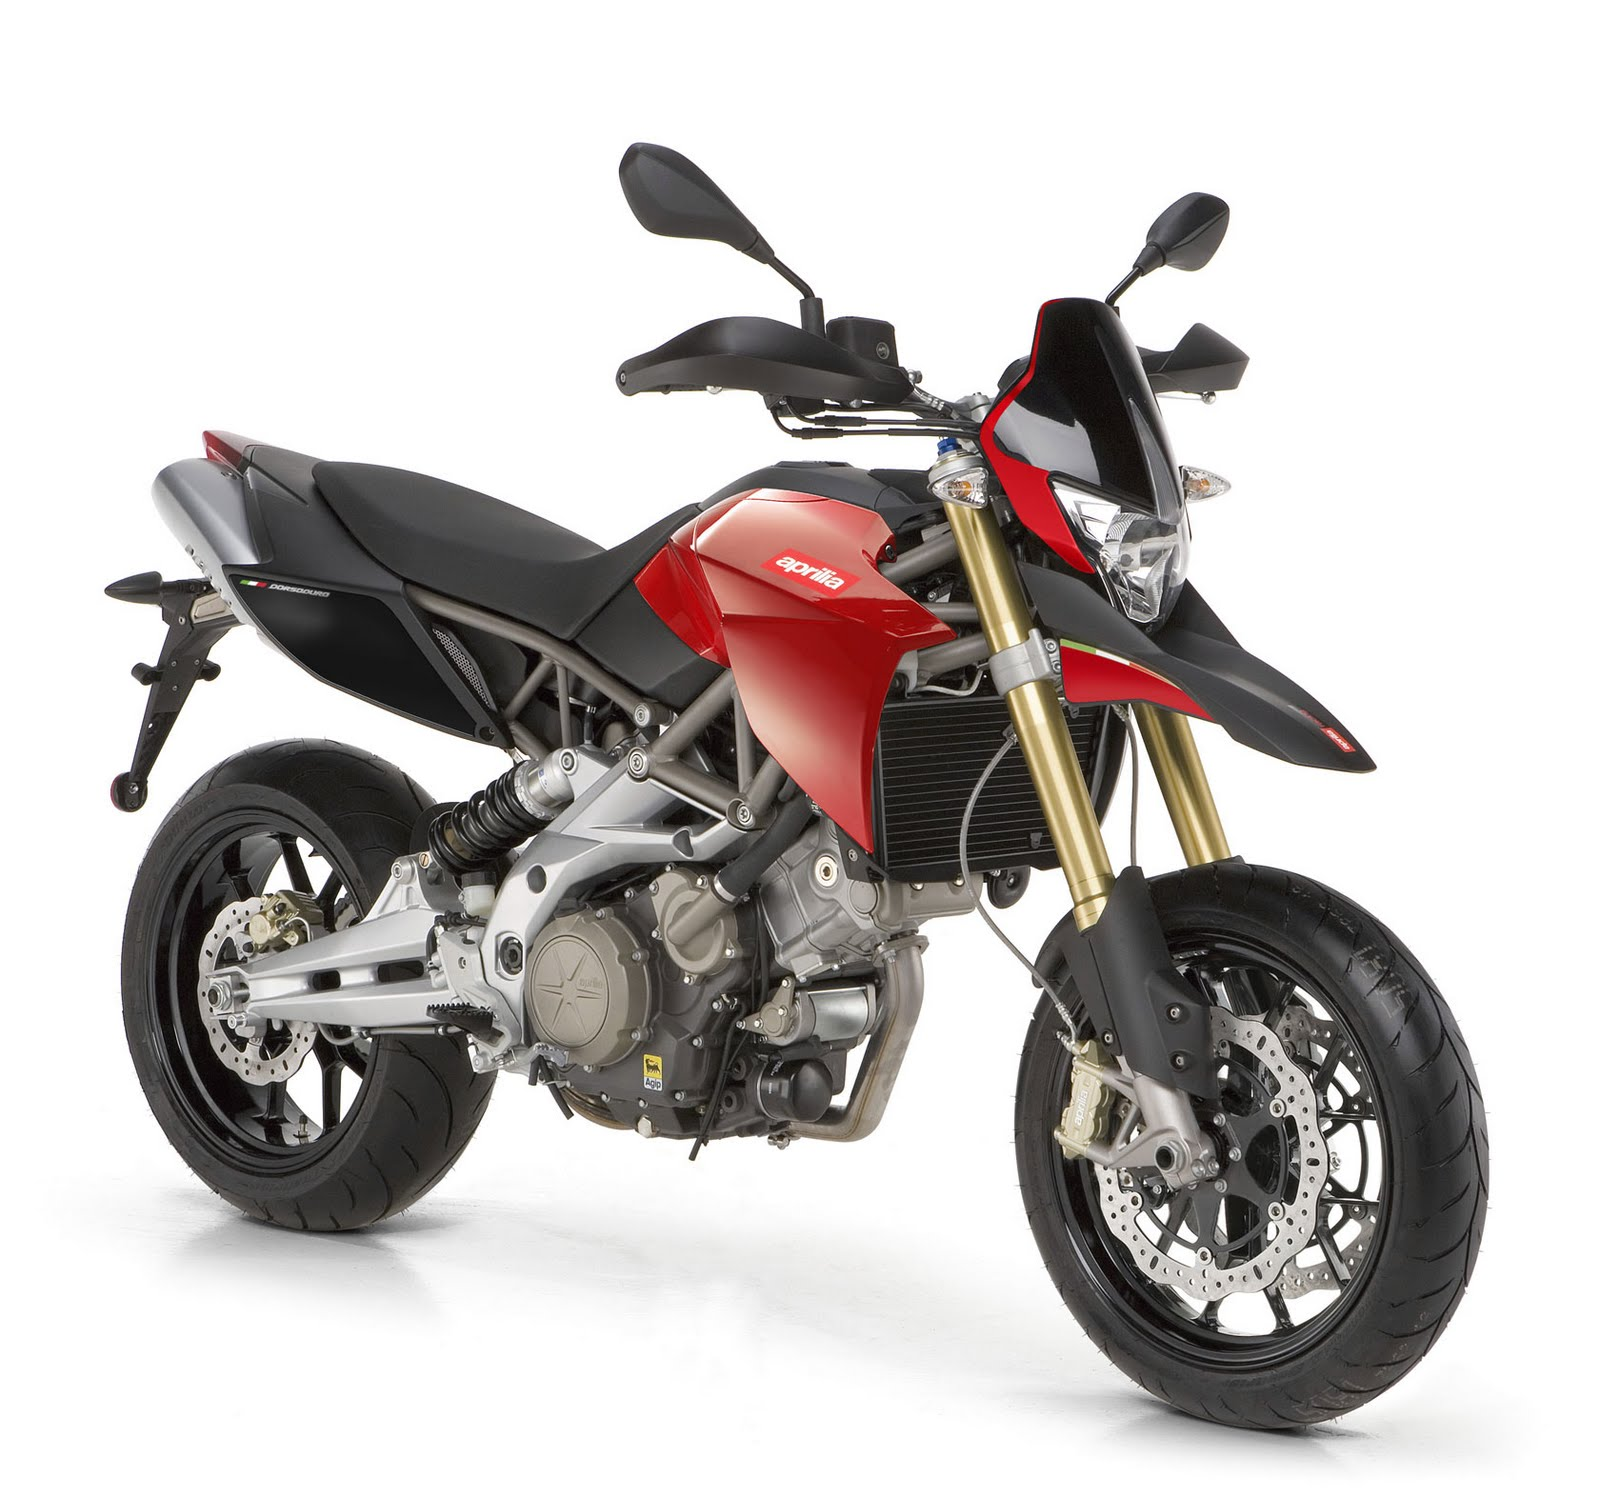 http://4.bp.blogspot.com/_64ZIIUw5Xgo/TEWNr5-h4rI/AAAAAAAAI4M/lRS6OFX7UMk/s1600/Gambar+Motor+Sport+Aprilia+Dorsoduro+750+2010.jpg